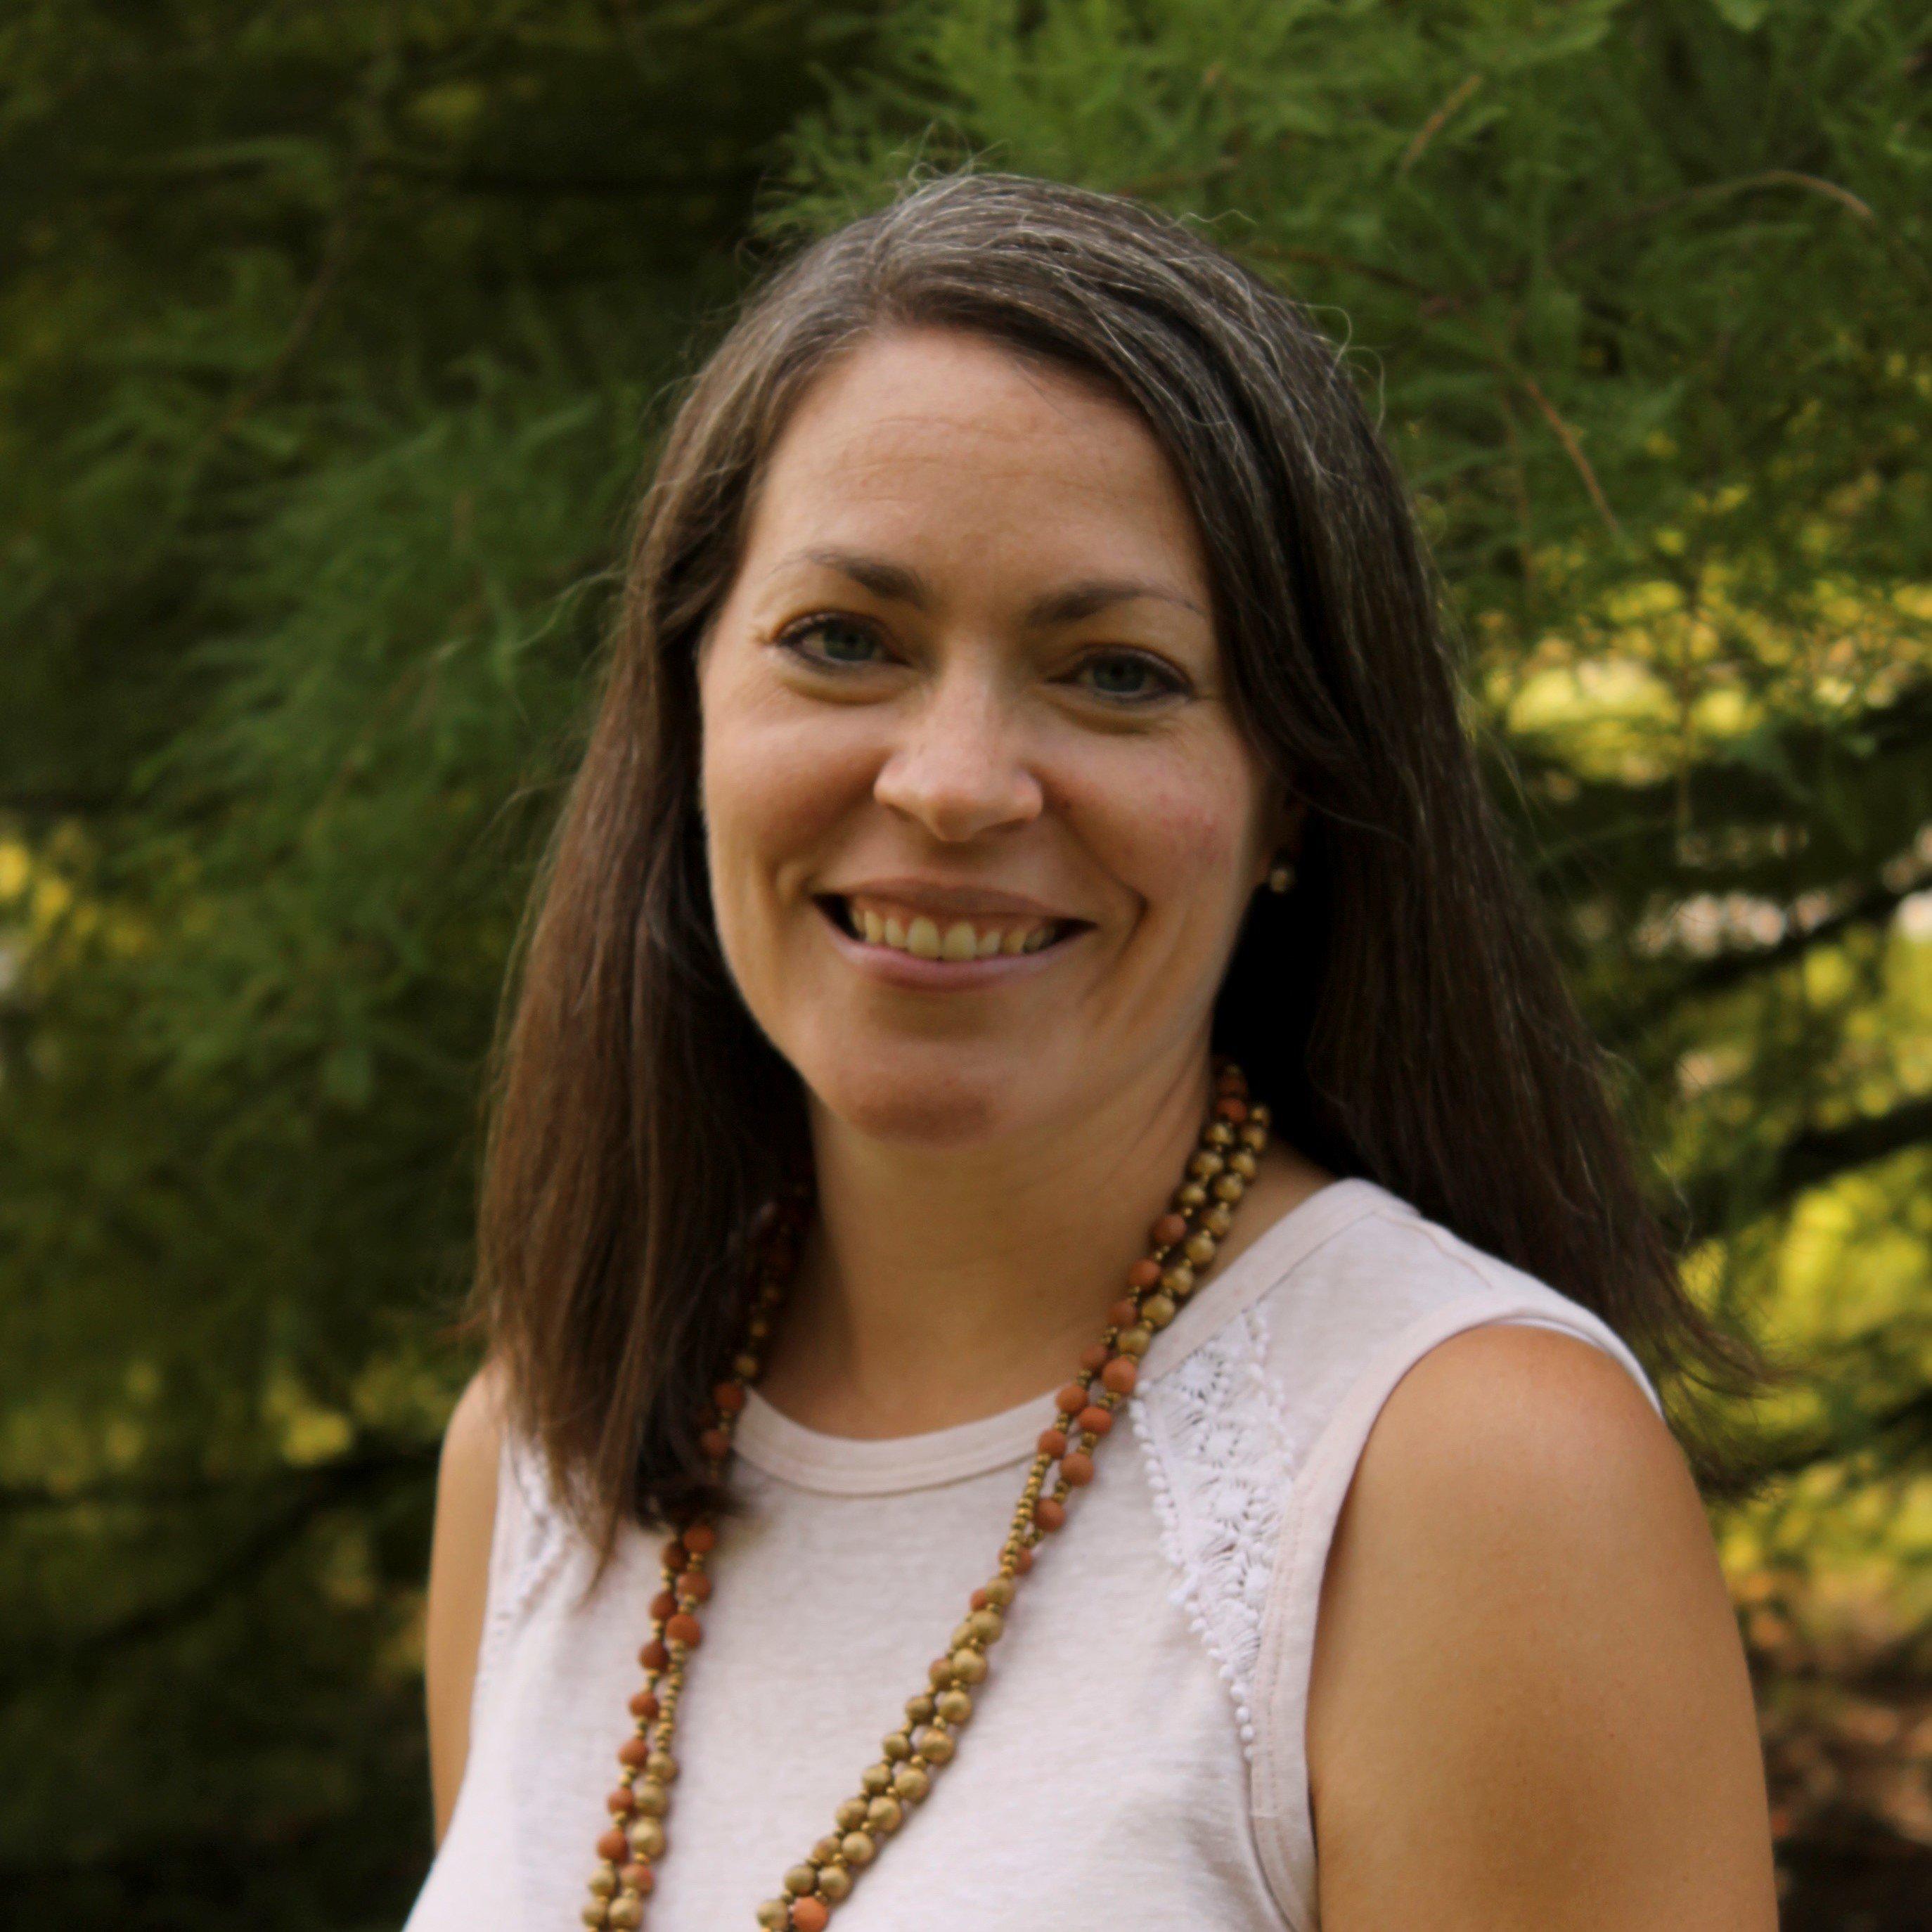 Jen Brendsel is a teacher's aide at Clapham School